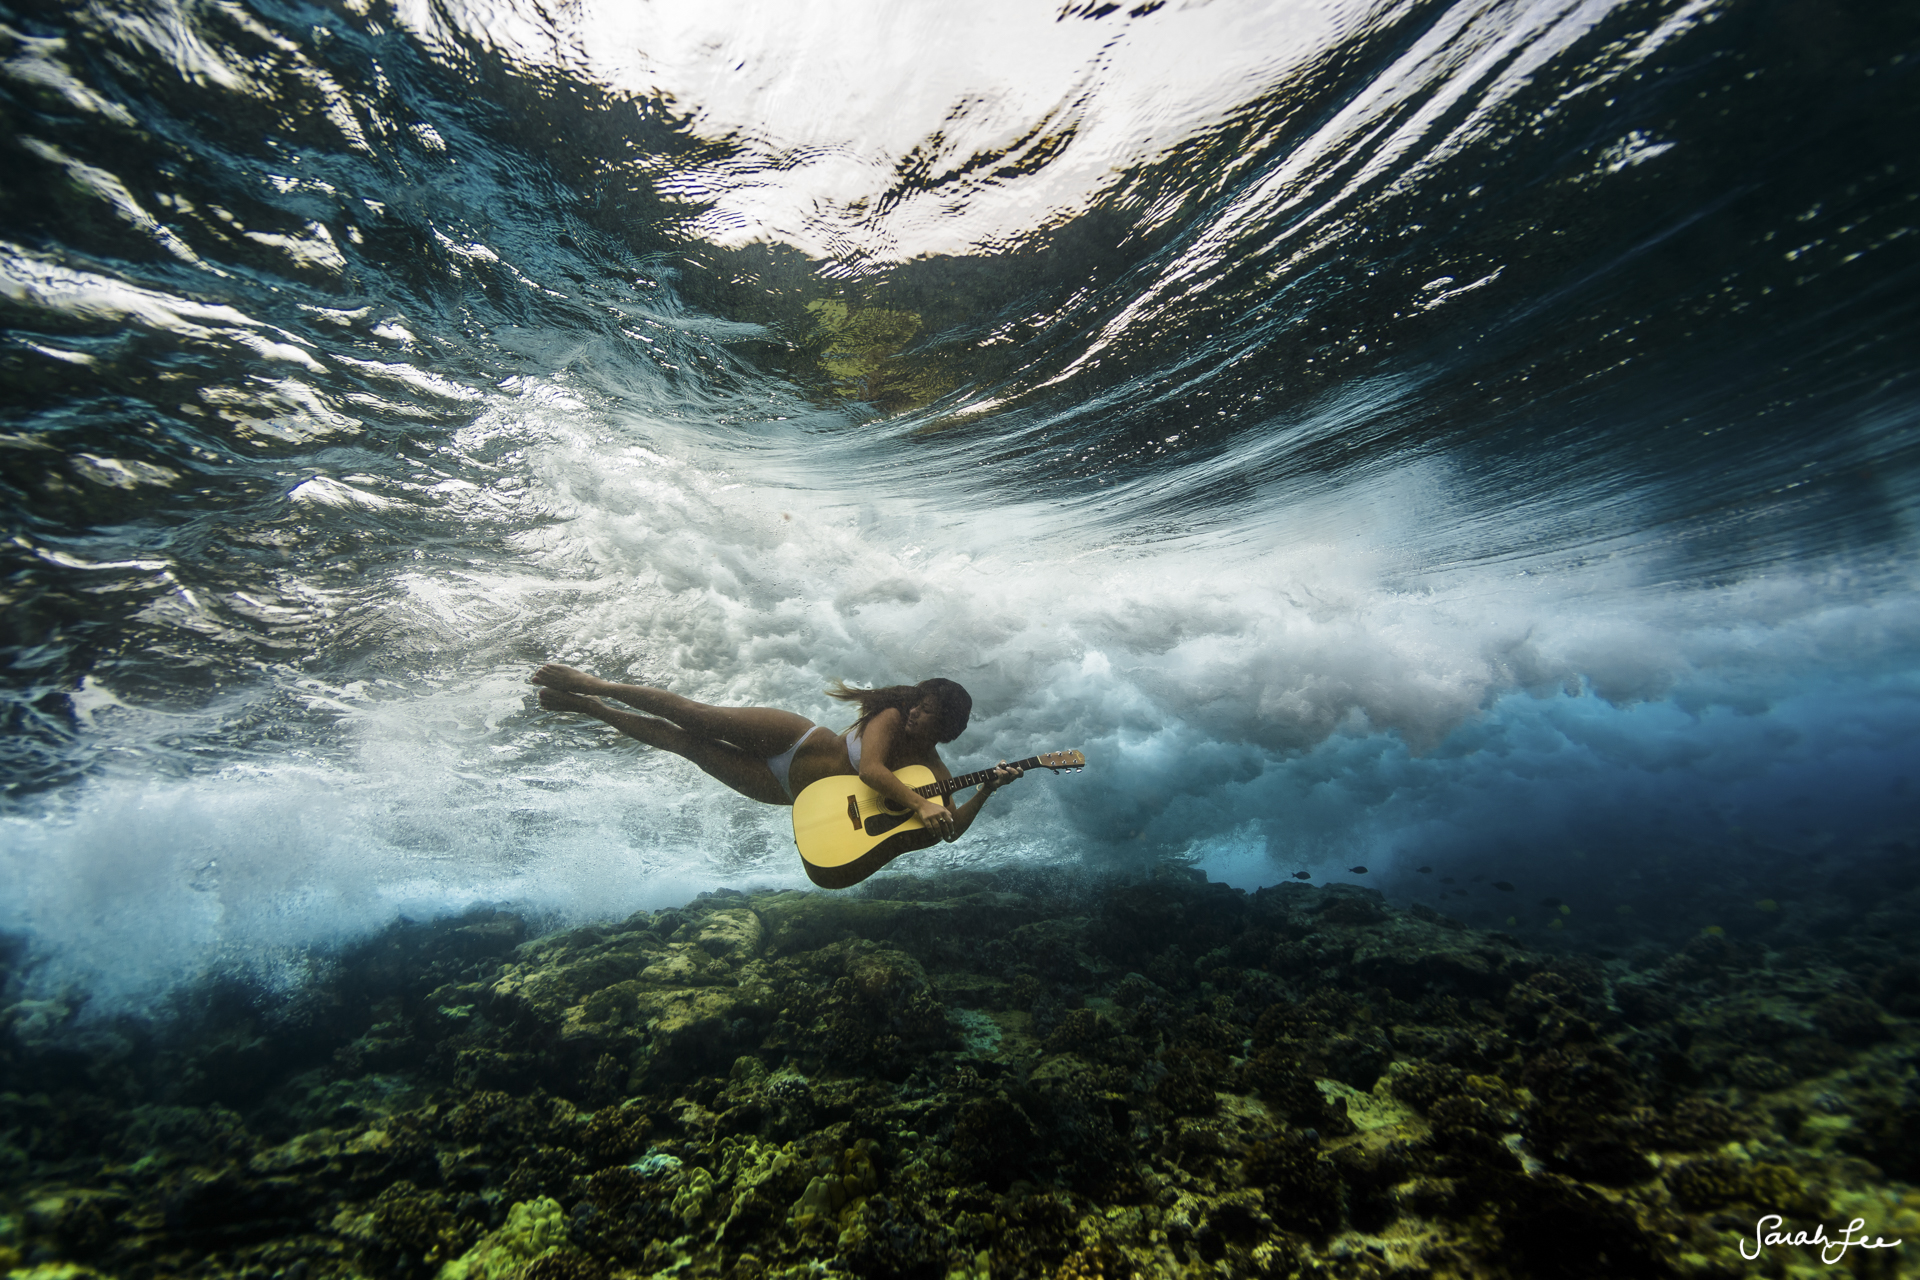 032_Sarah_Lee_Photography_Underwater_3193.jpg